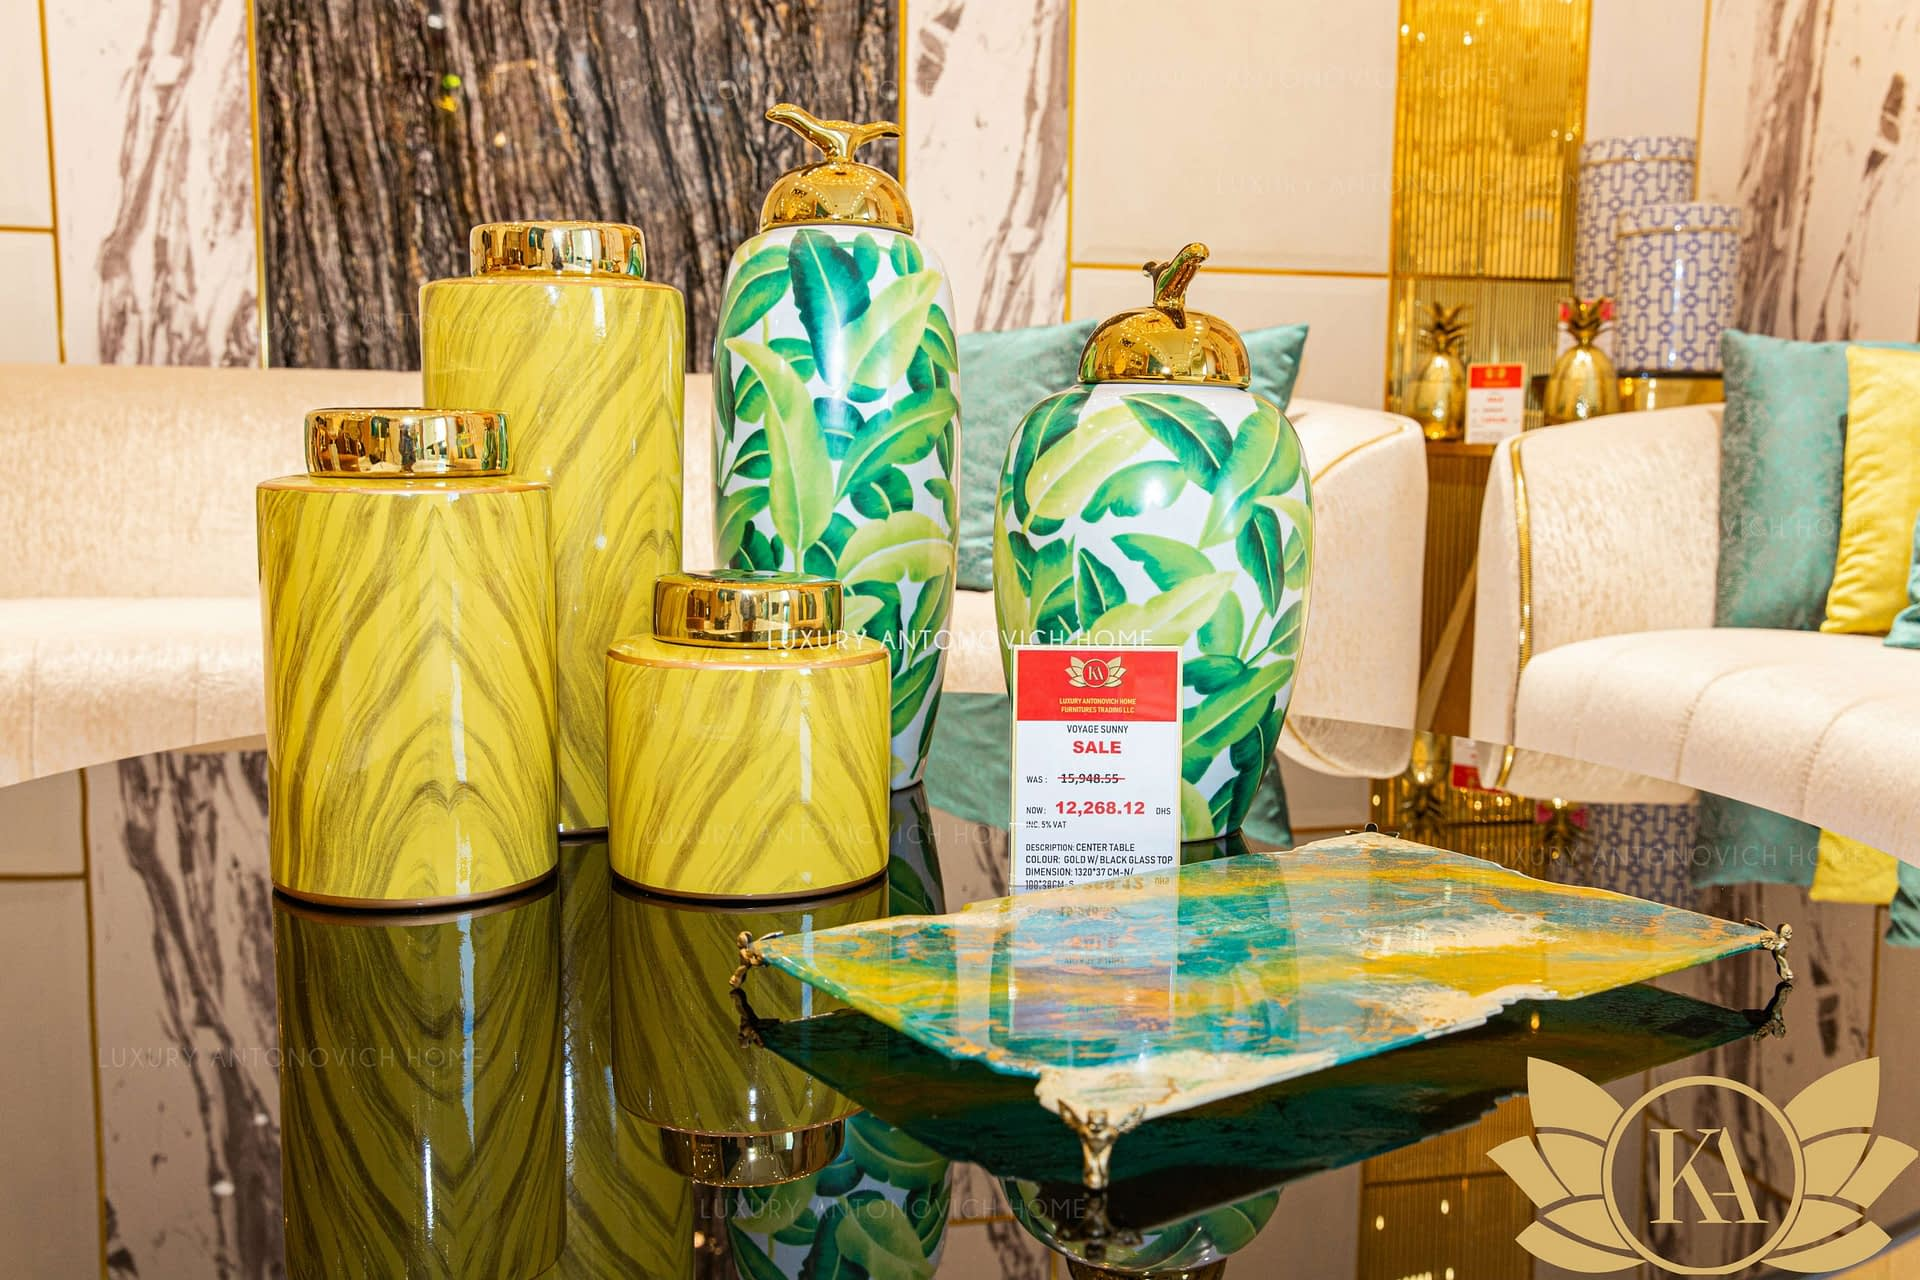 ka-furniture-showroom-your-home-decorating-center